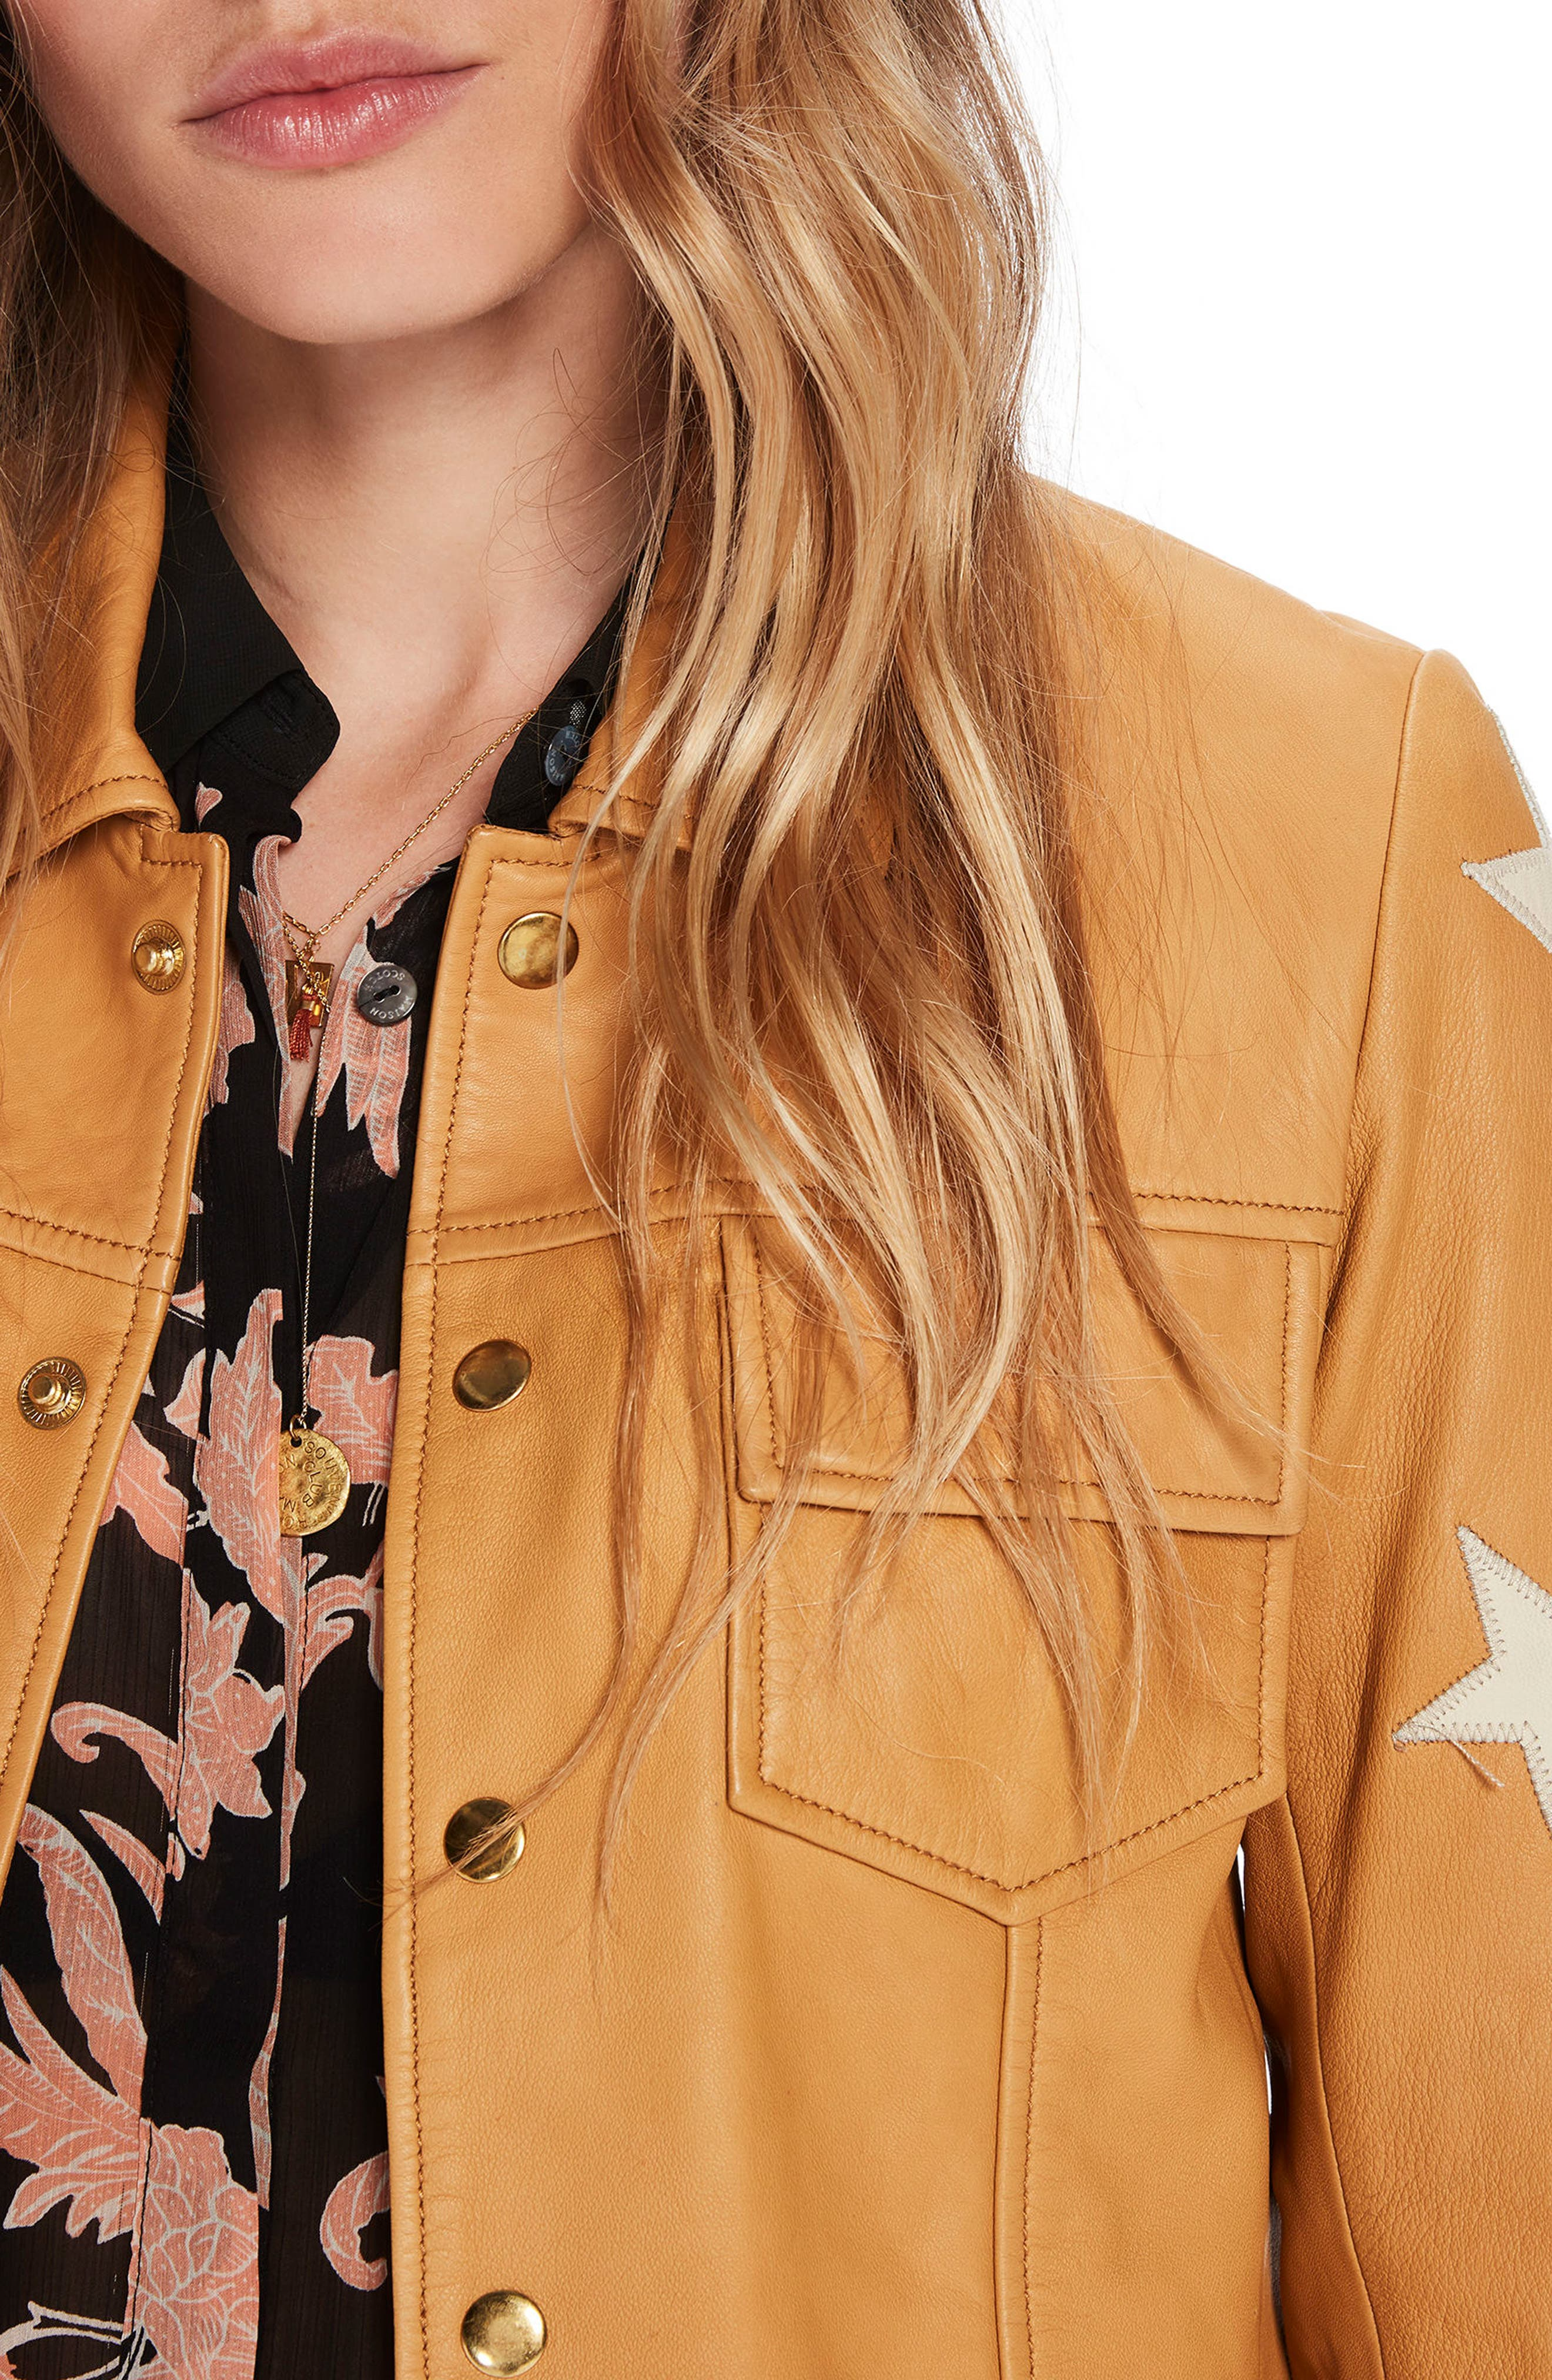 Sheepskin Leather Shirt Jacket,                             Alternate thumbnail 4, color,                             Color 1942 Sahara